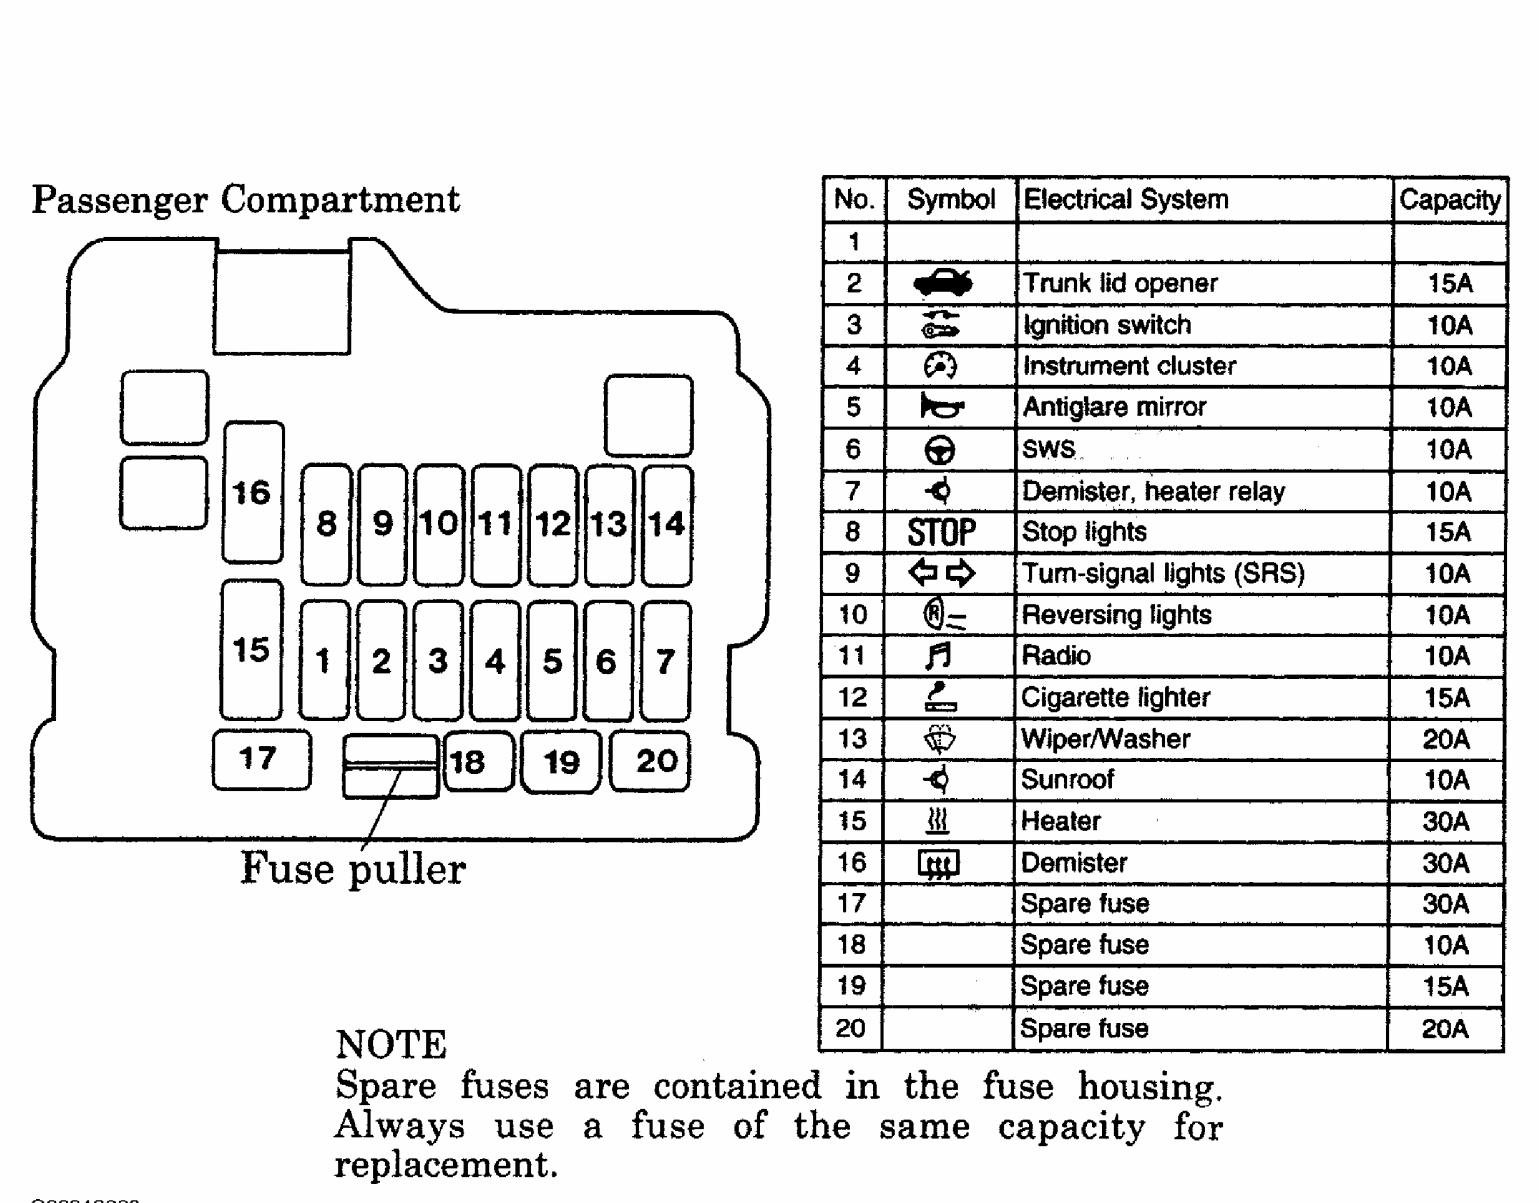 hight resolution of 2012 outlander fuse panel diagram